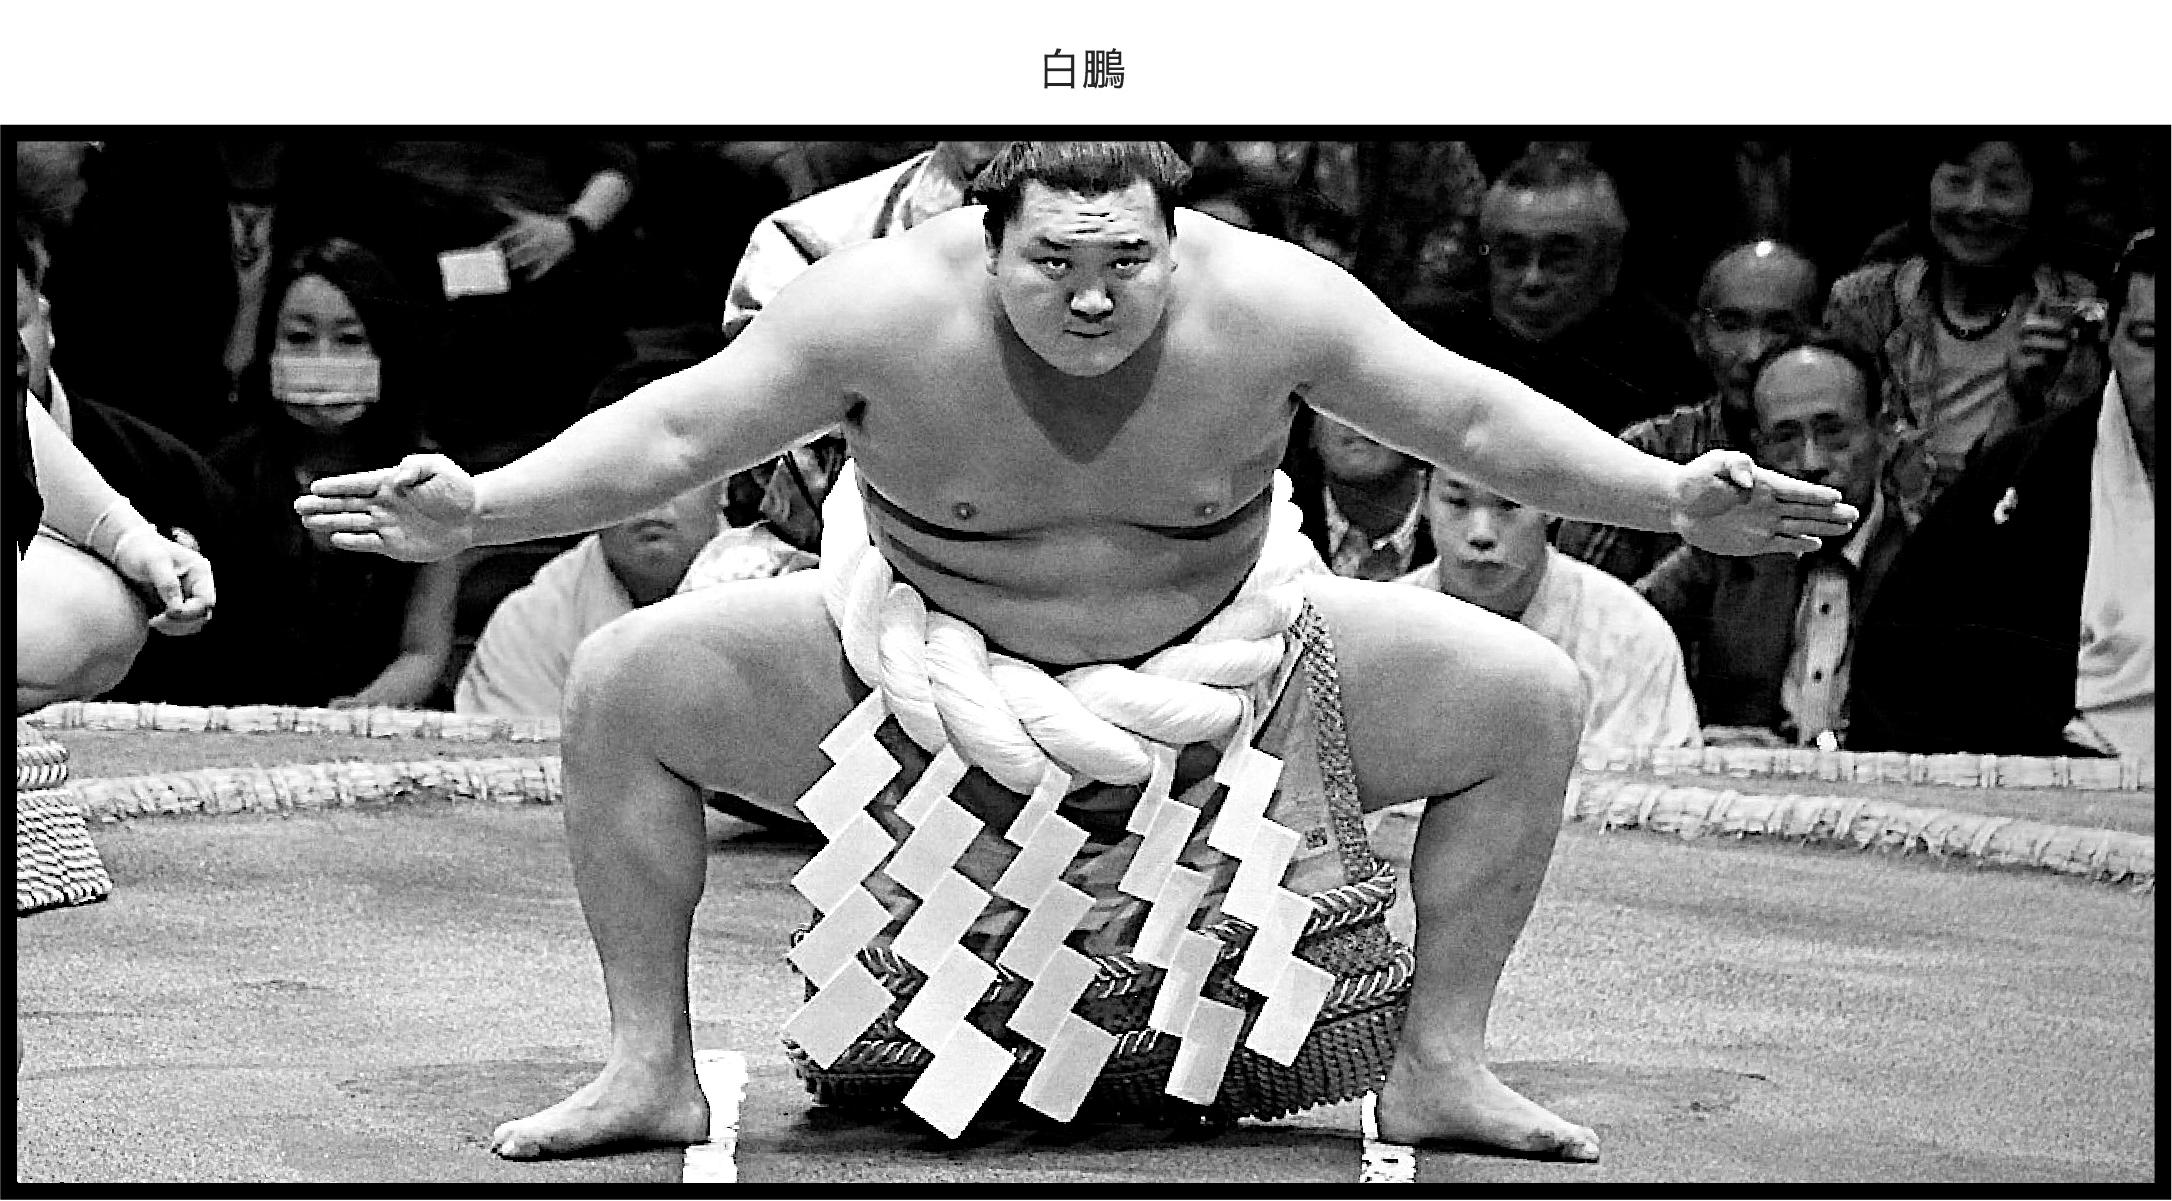 The highest-ranked sumo wrestlers like Hakuho wear the yokozuna rope during dohyo-iri (the ring-entering ceremony).